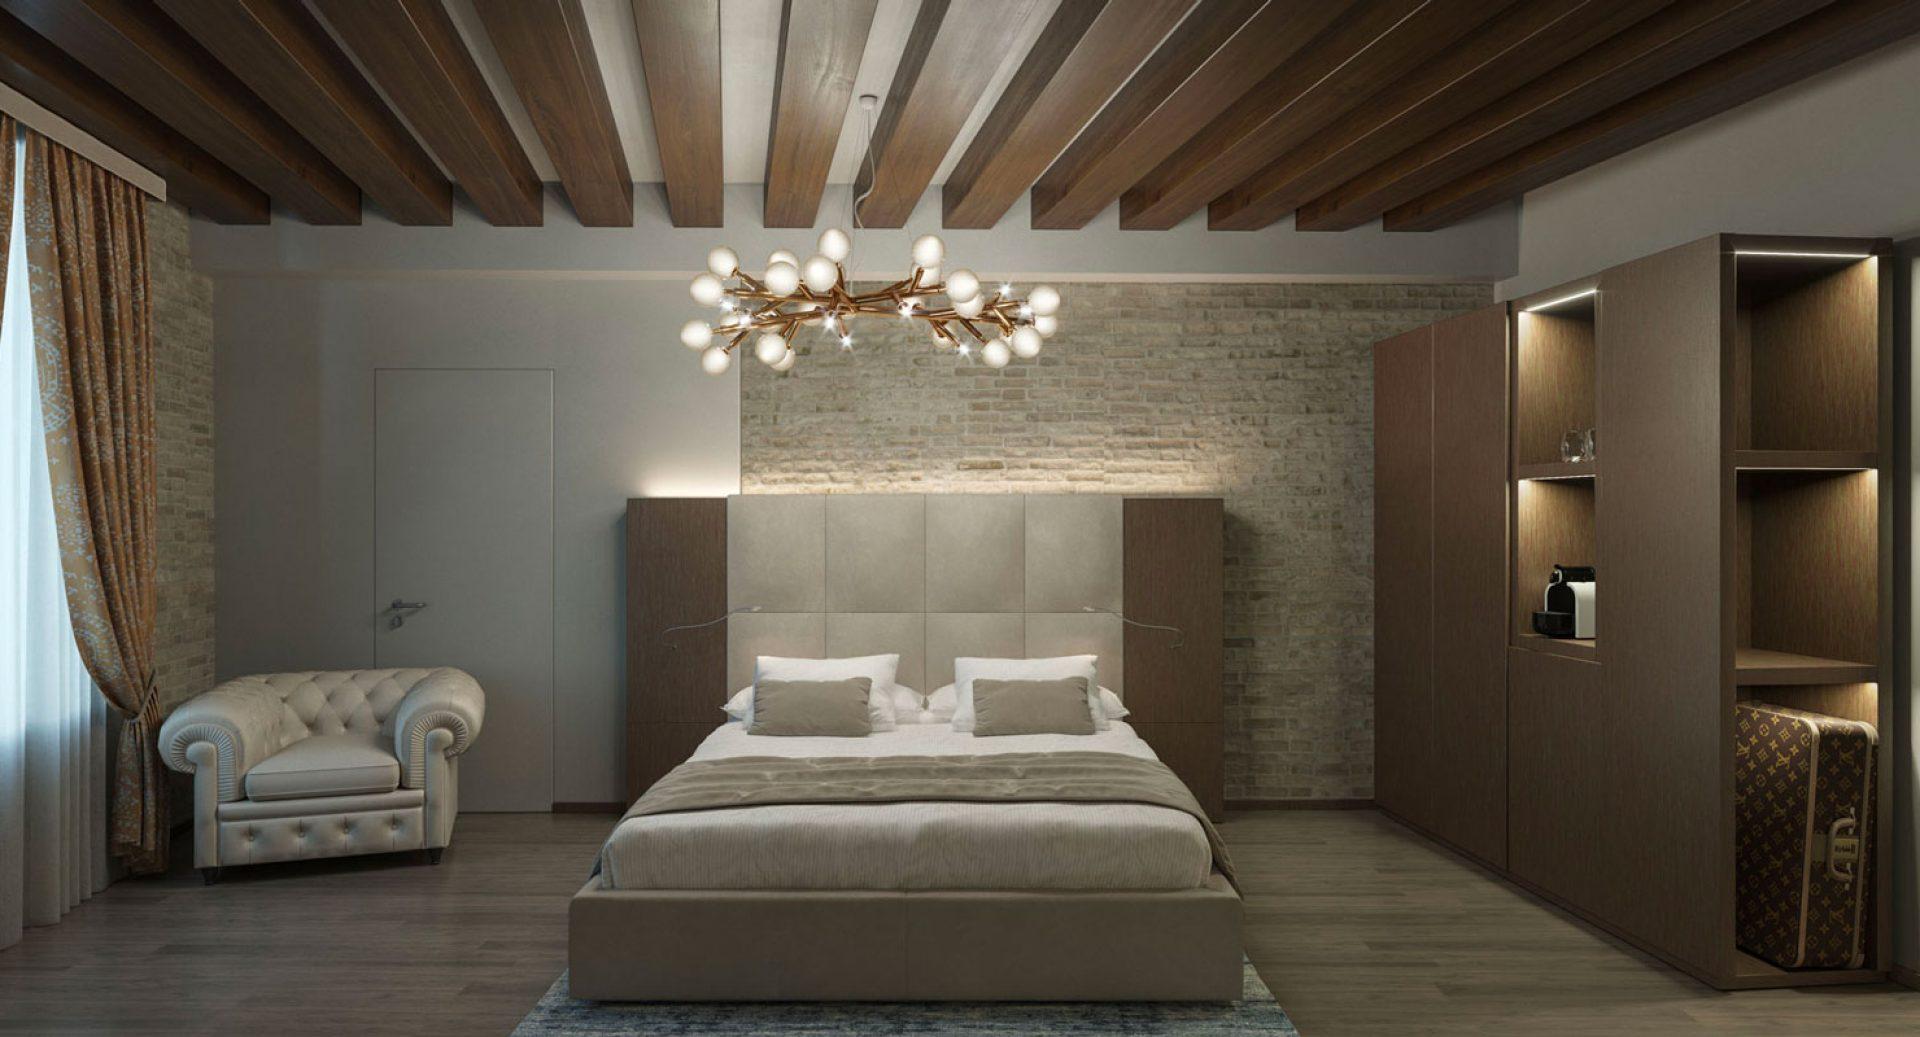 (XXL) Interconnecting Rooms